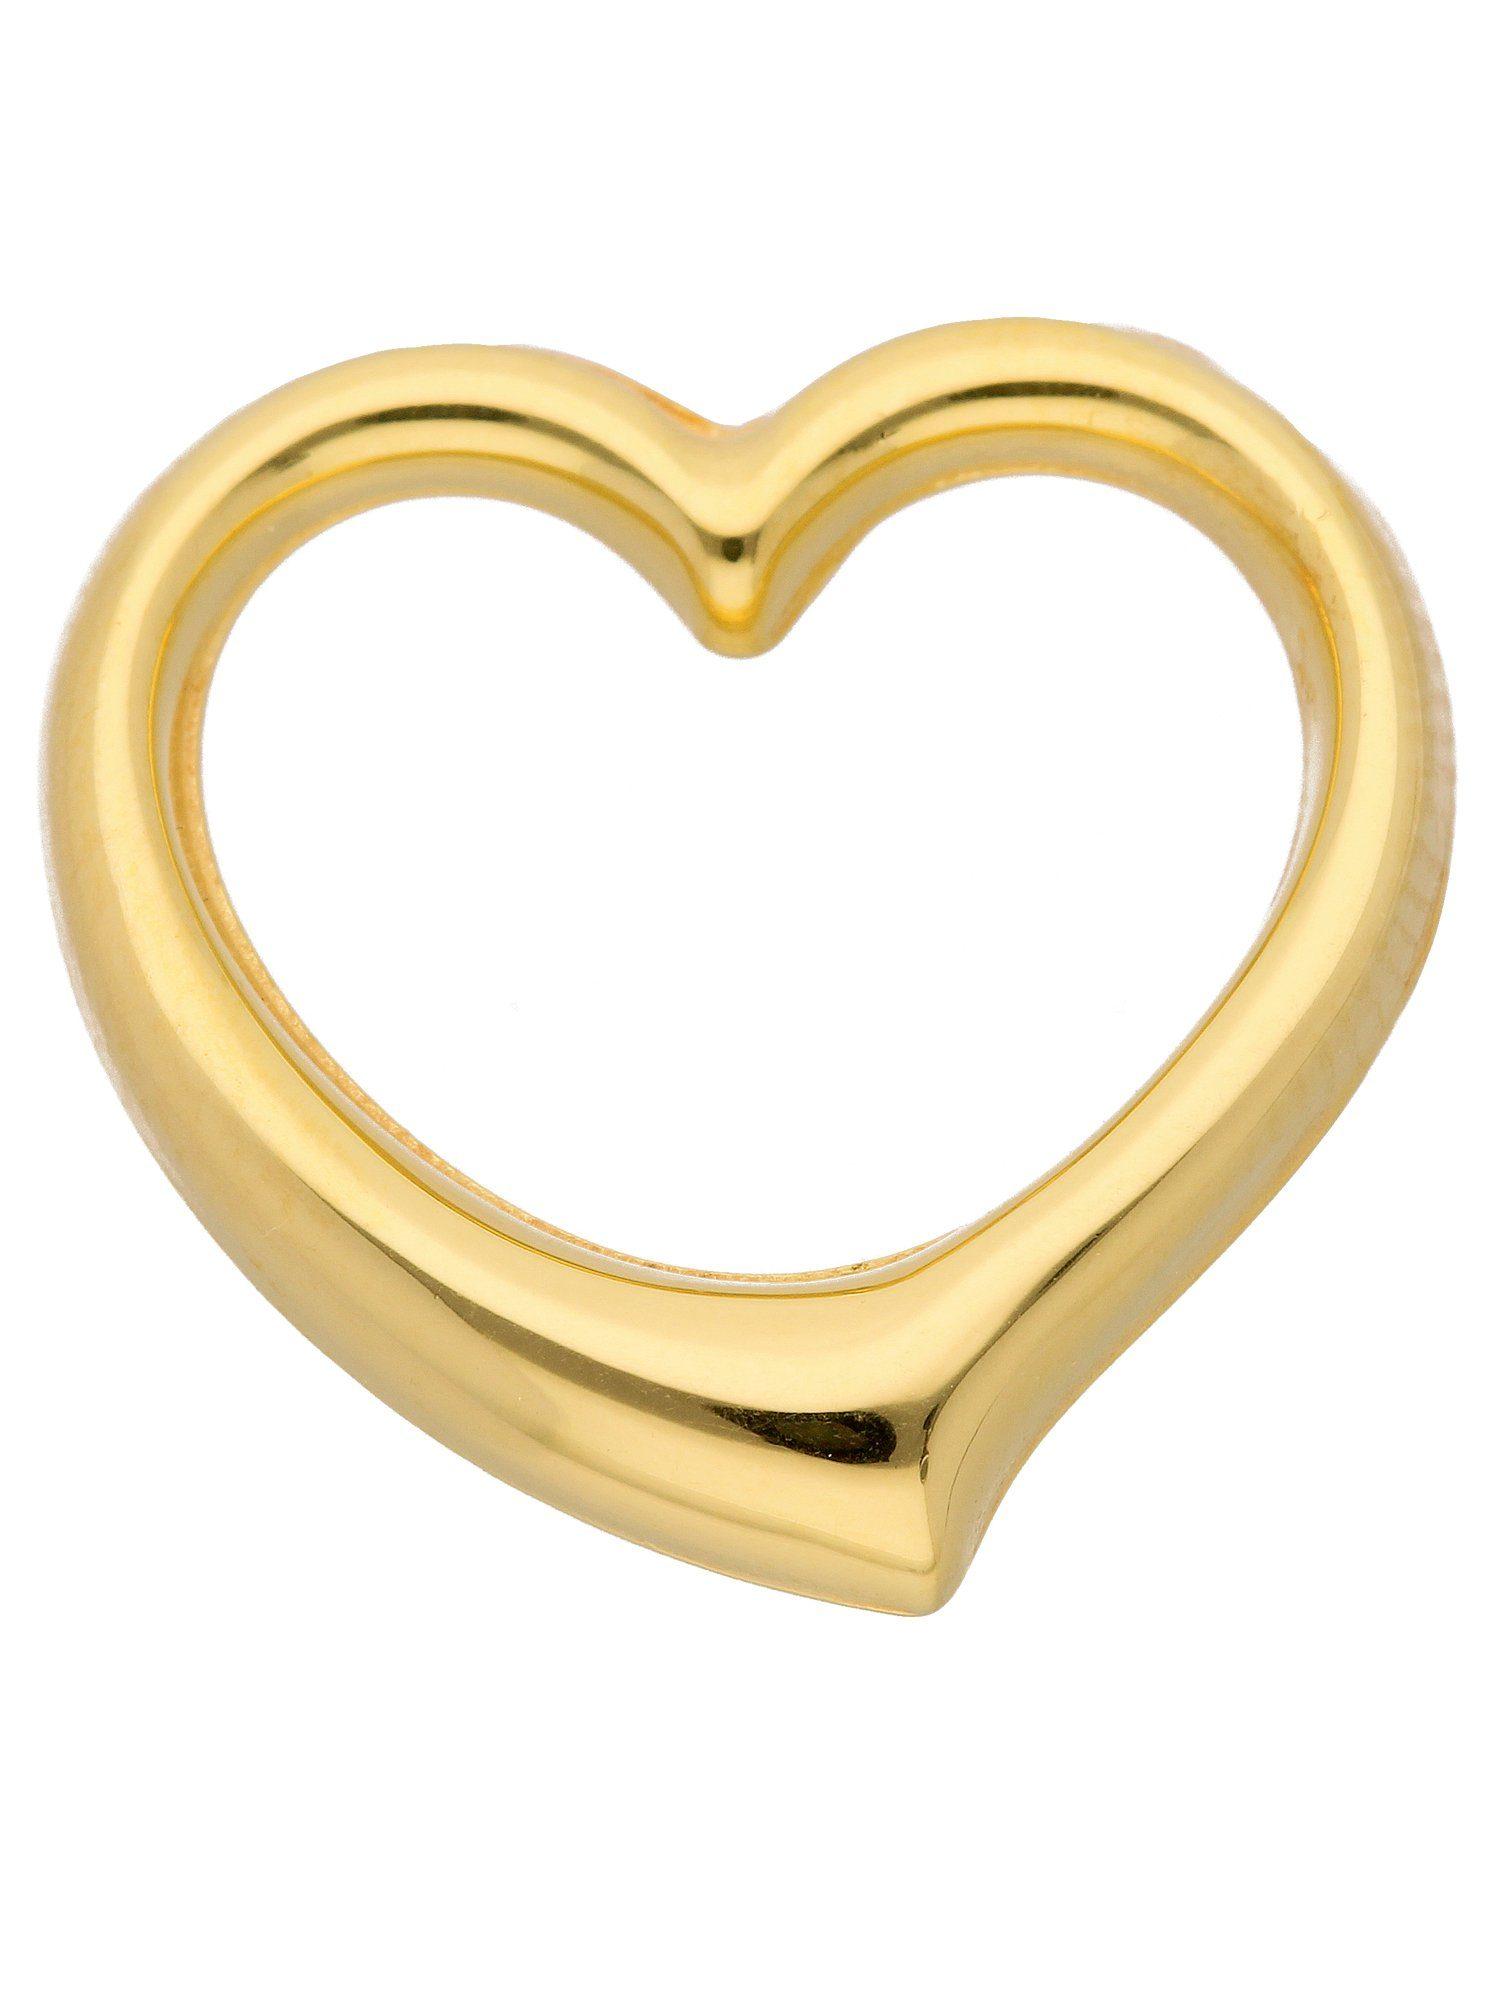 Adelia´s Kettenanhänger »Gold Anhänger« Swingheart 8 k 333 Gelbgold